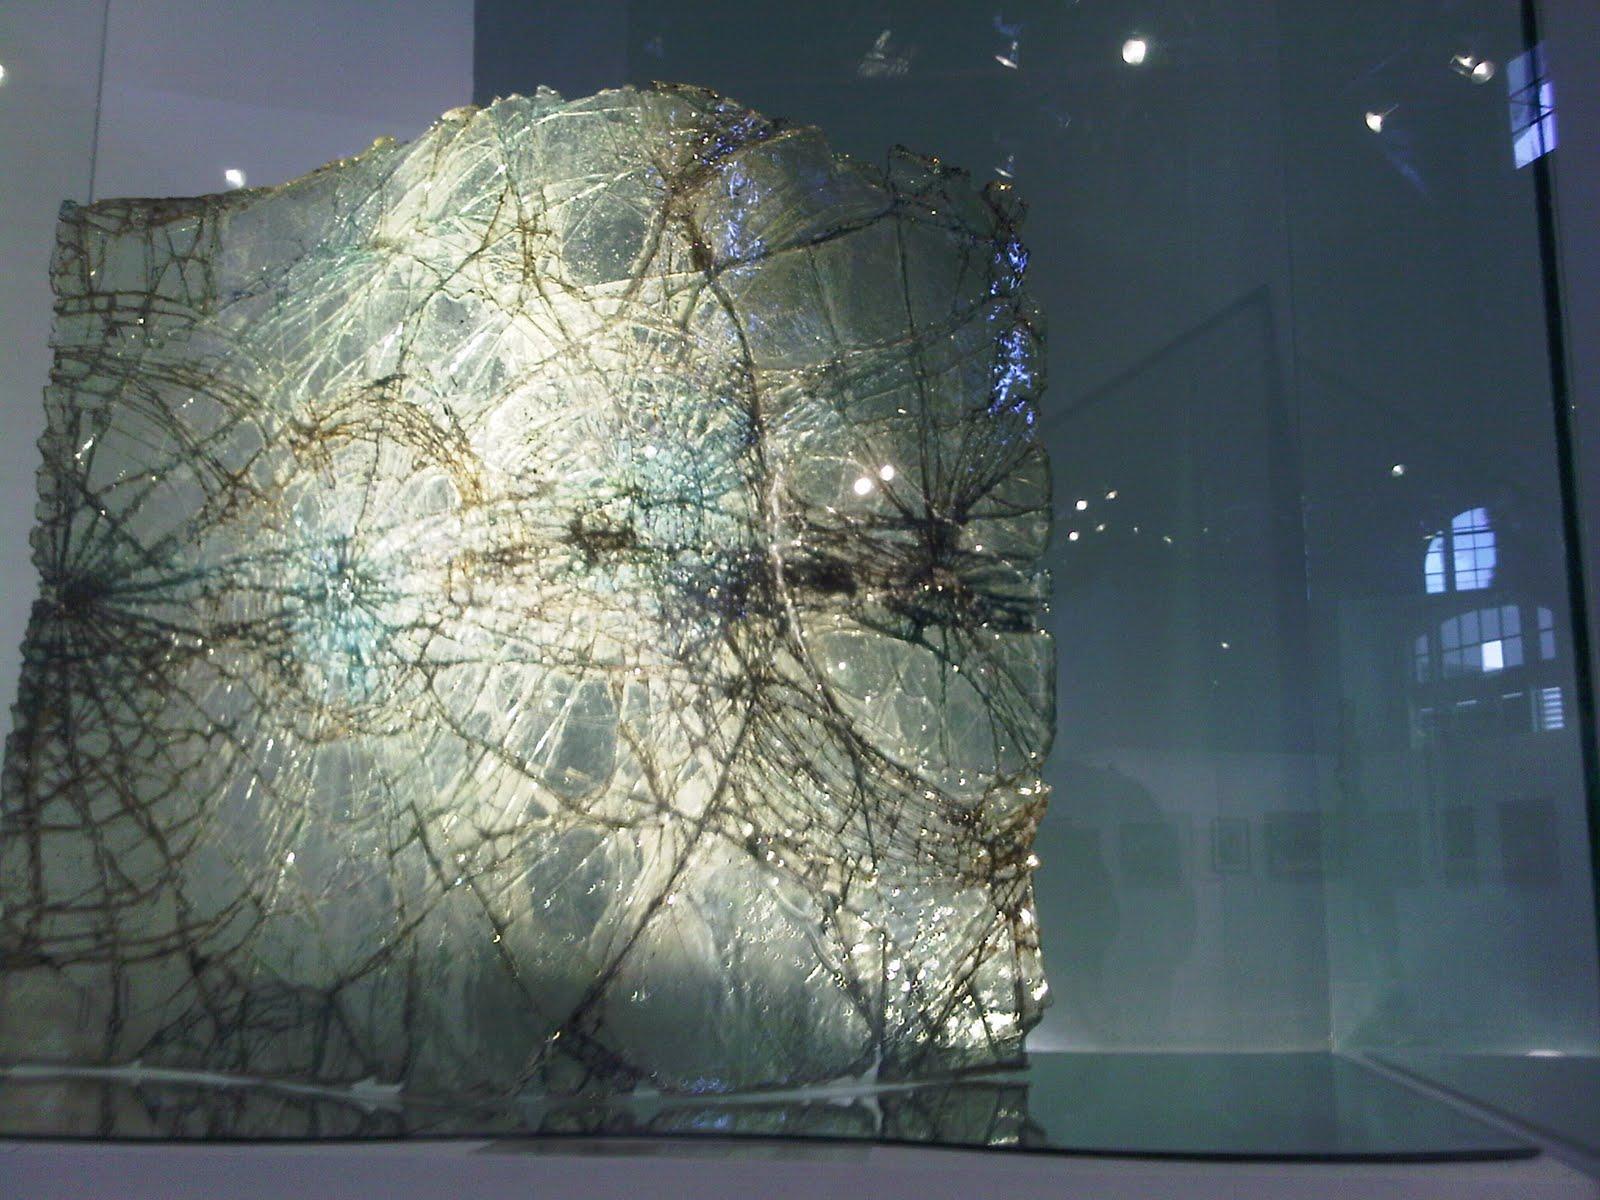 Washington Glass School Glass Fun Fact Prince Ruperts Drops And